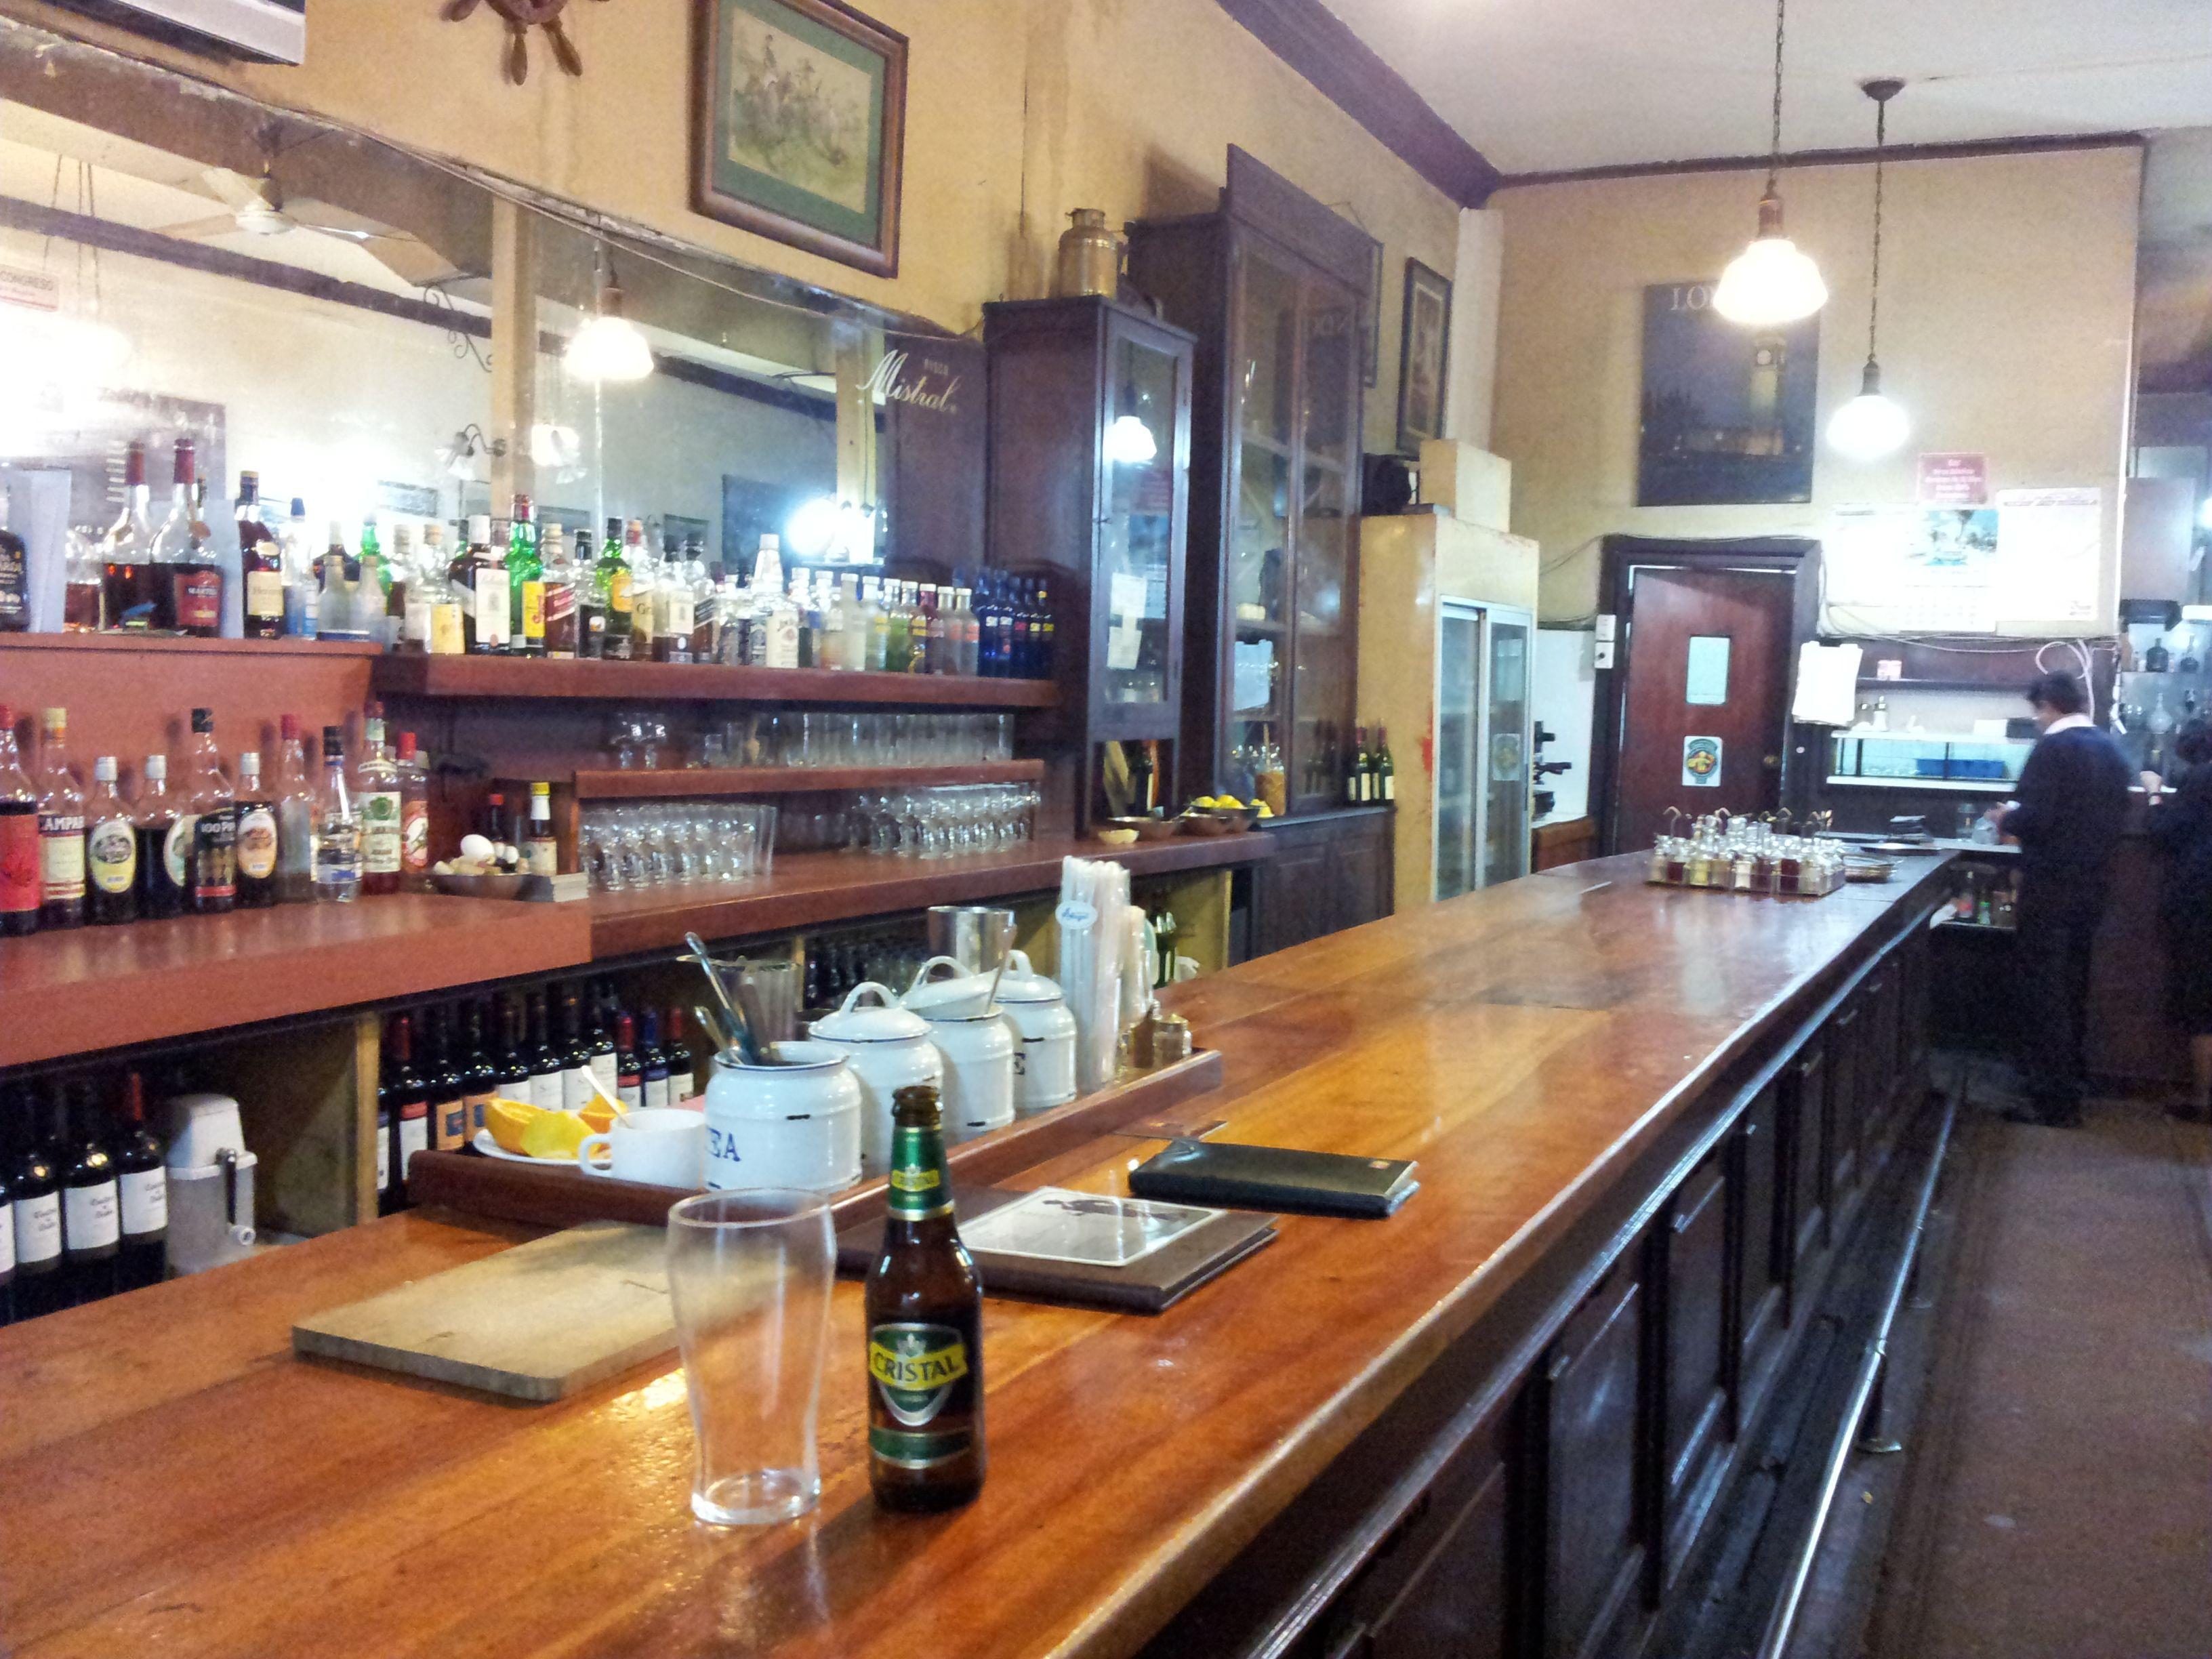 Bar ingles valparaiso interior designer valparaiso Kitchen remodeling valparaiso indiana